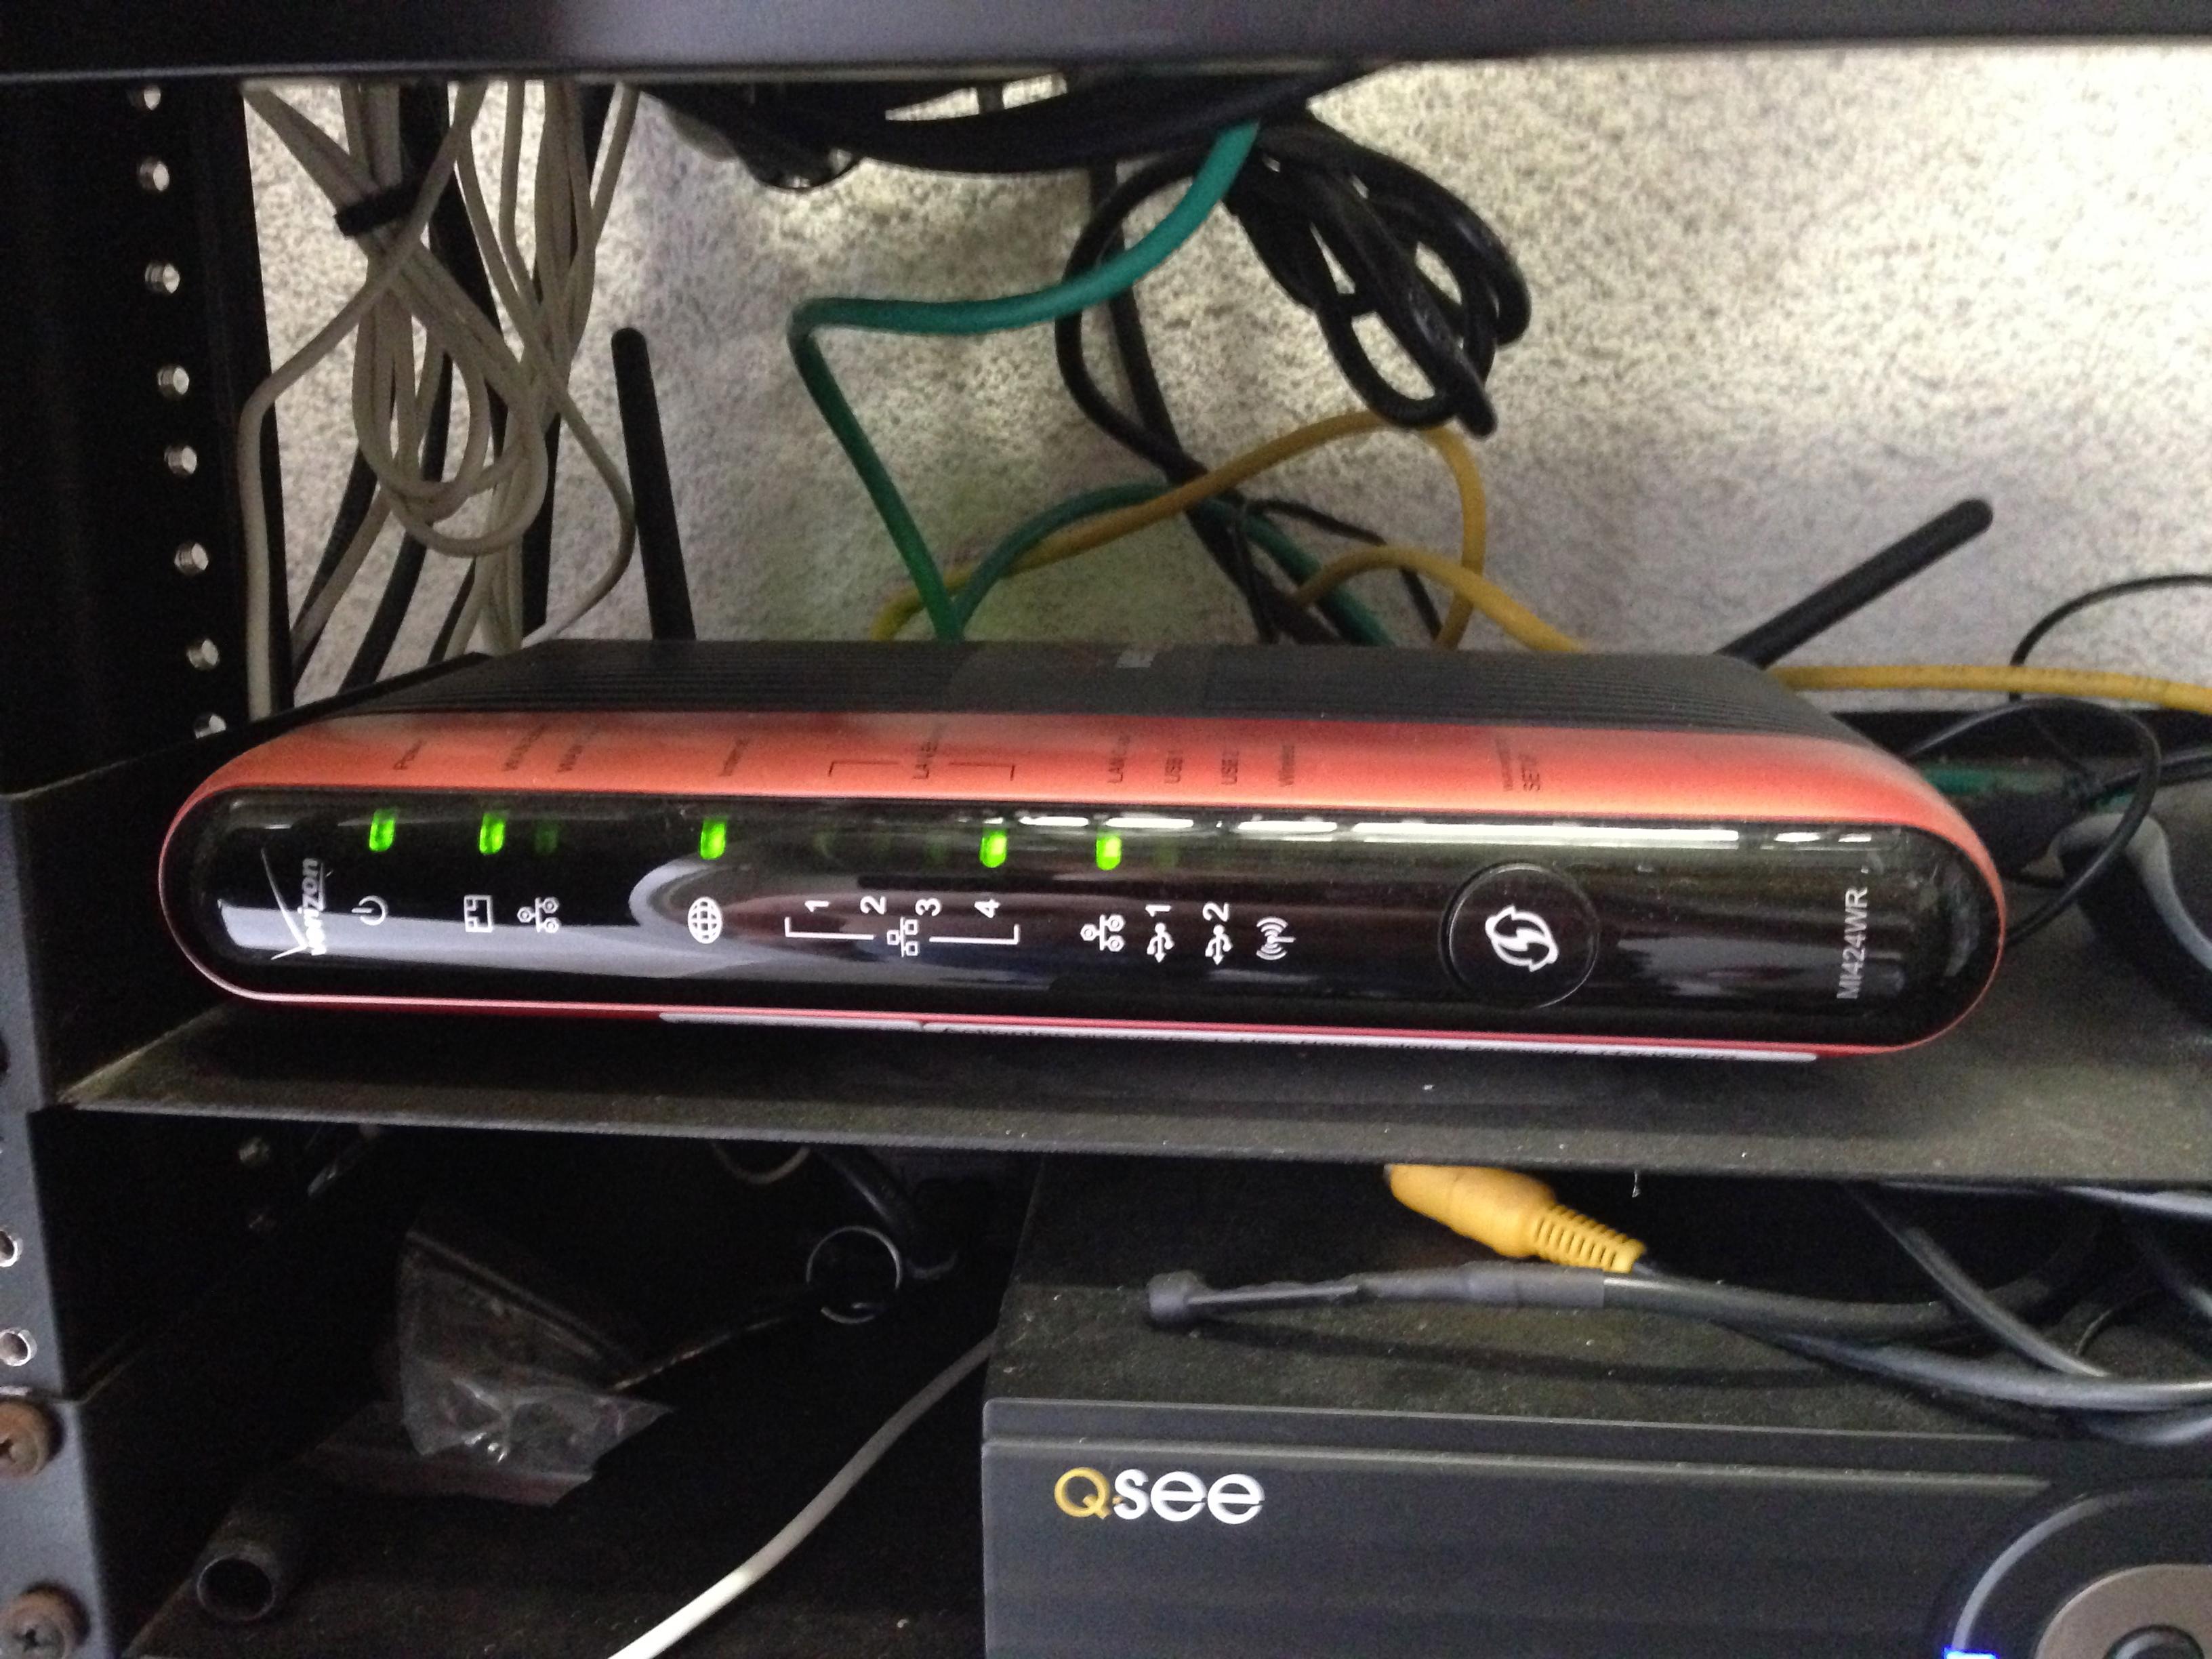 fios tv wiring diagram chevrolet truck diagrams verizon home theater to telephone